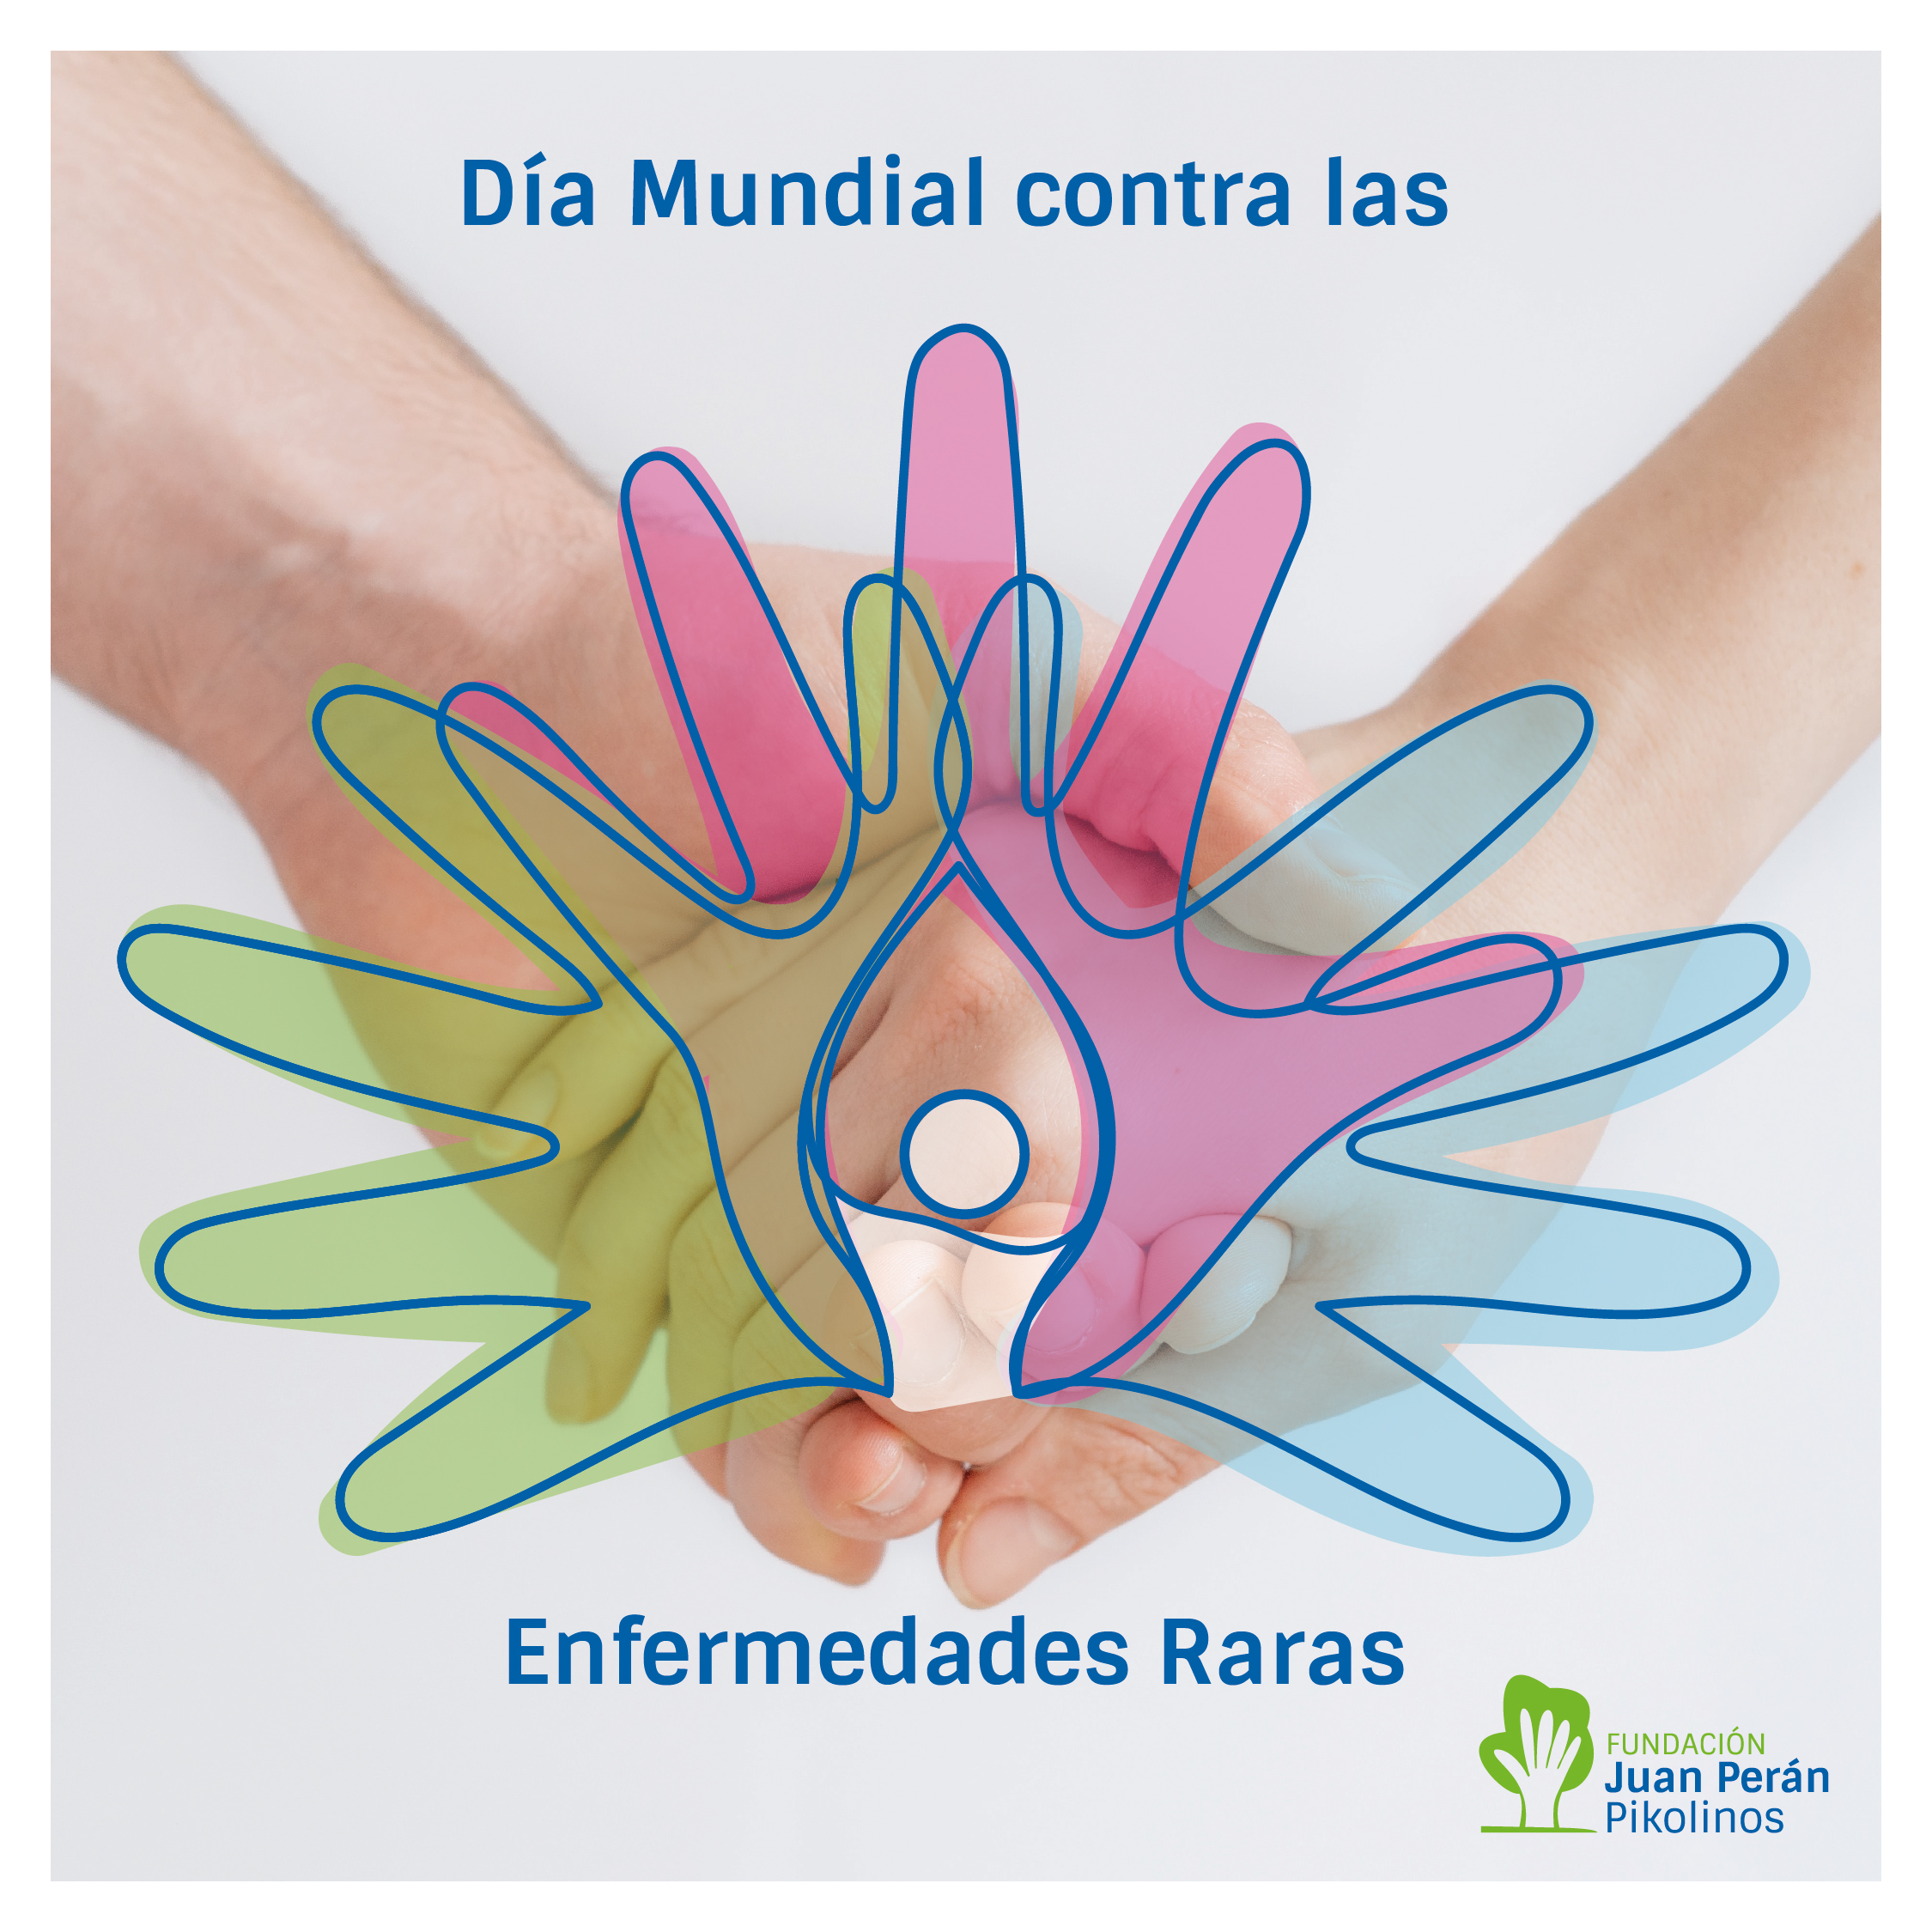 fundacion_rrss_firma_diamundial_enfermedadesraras_1_mesa-de-trabajo-1